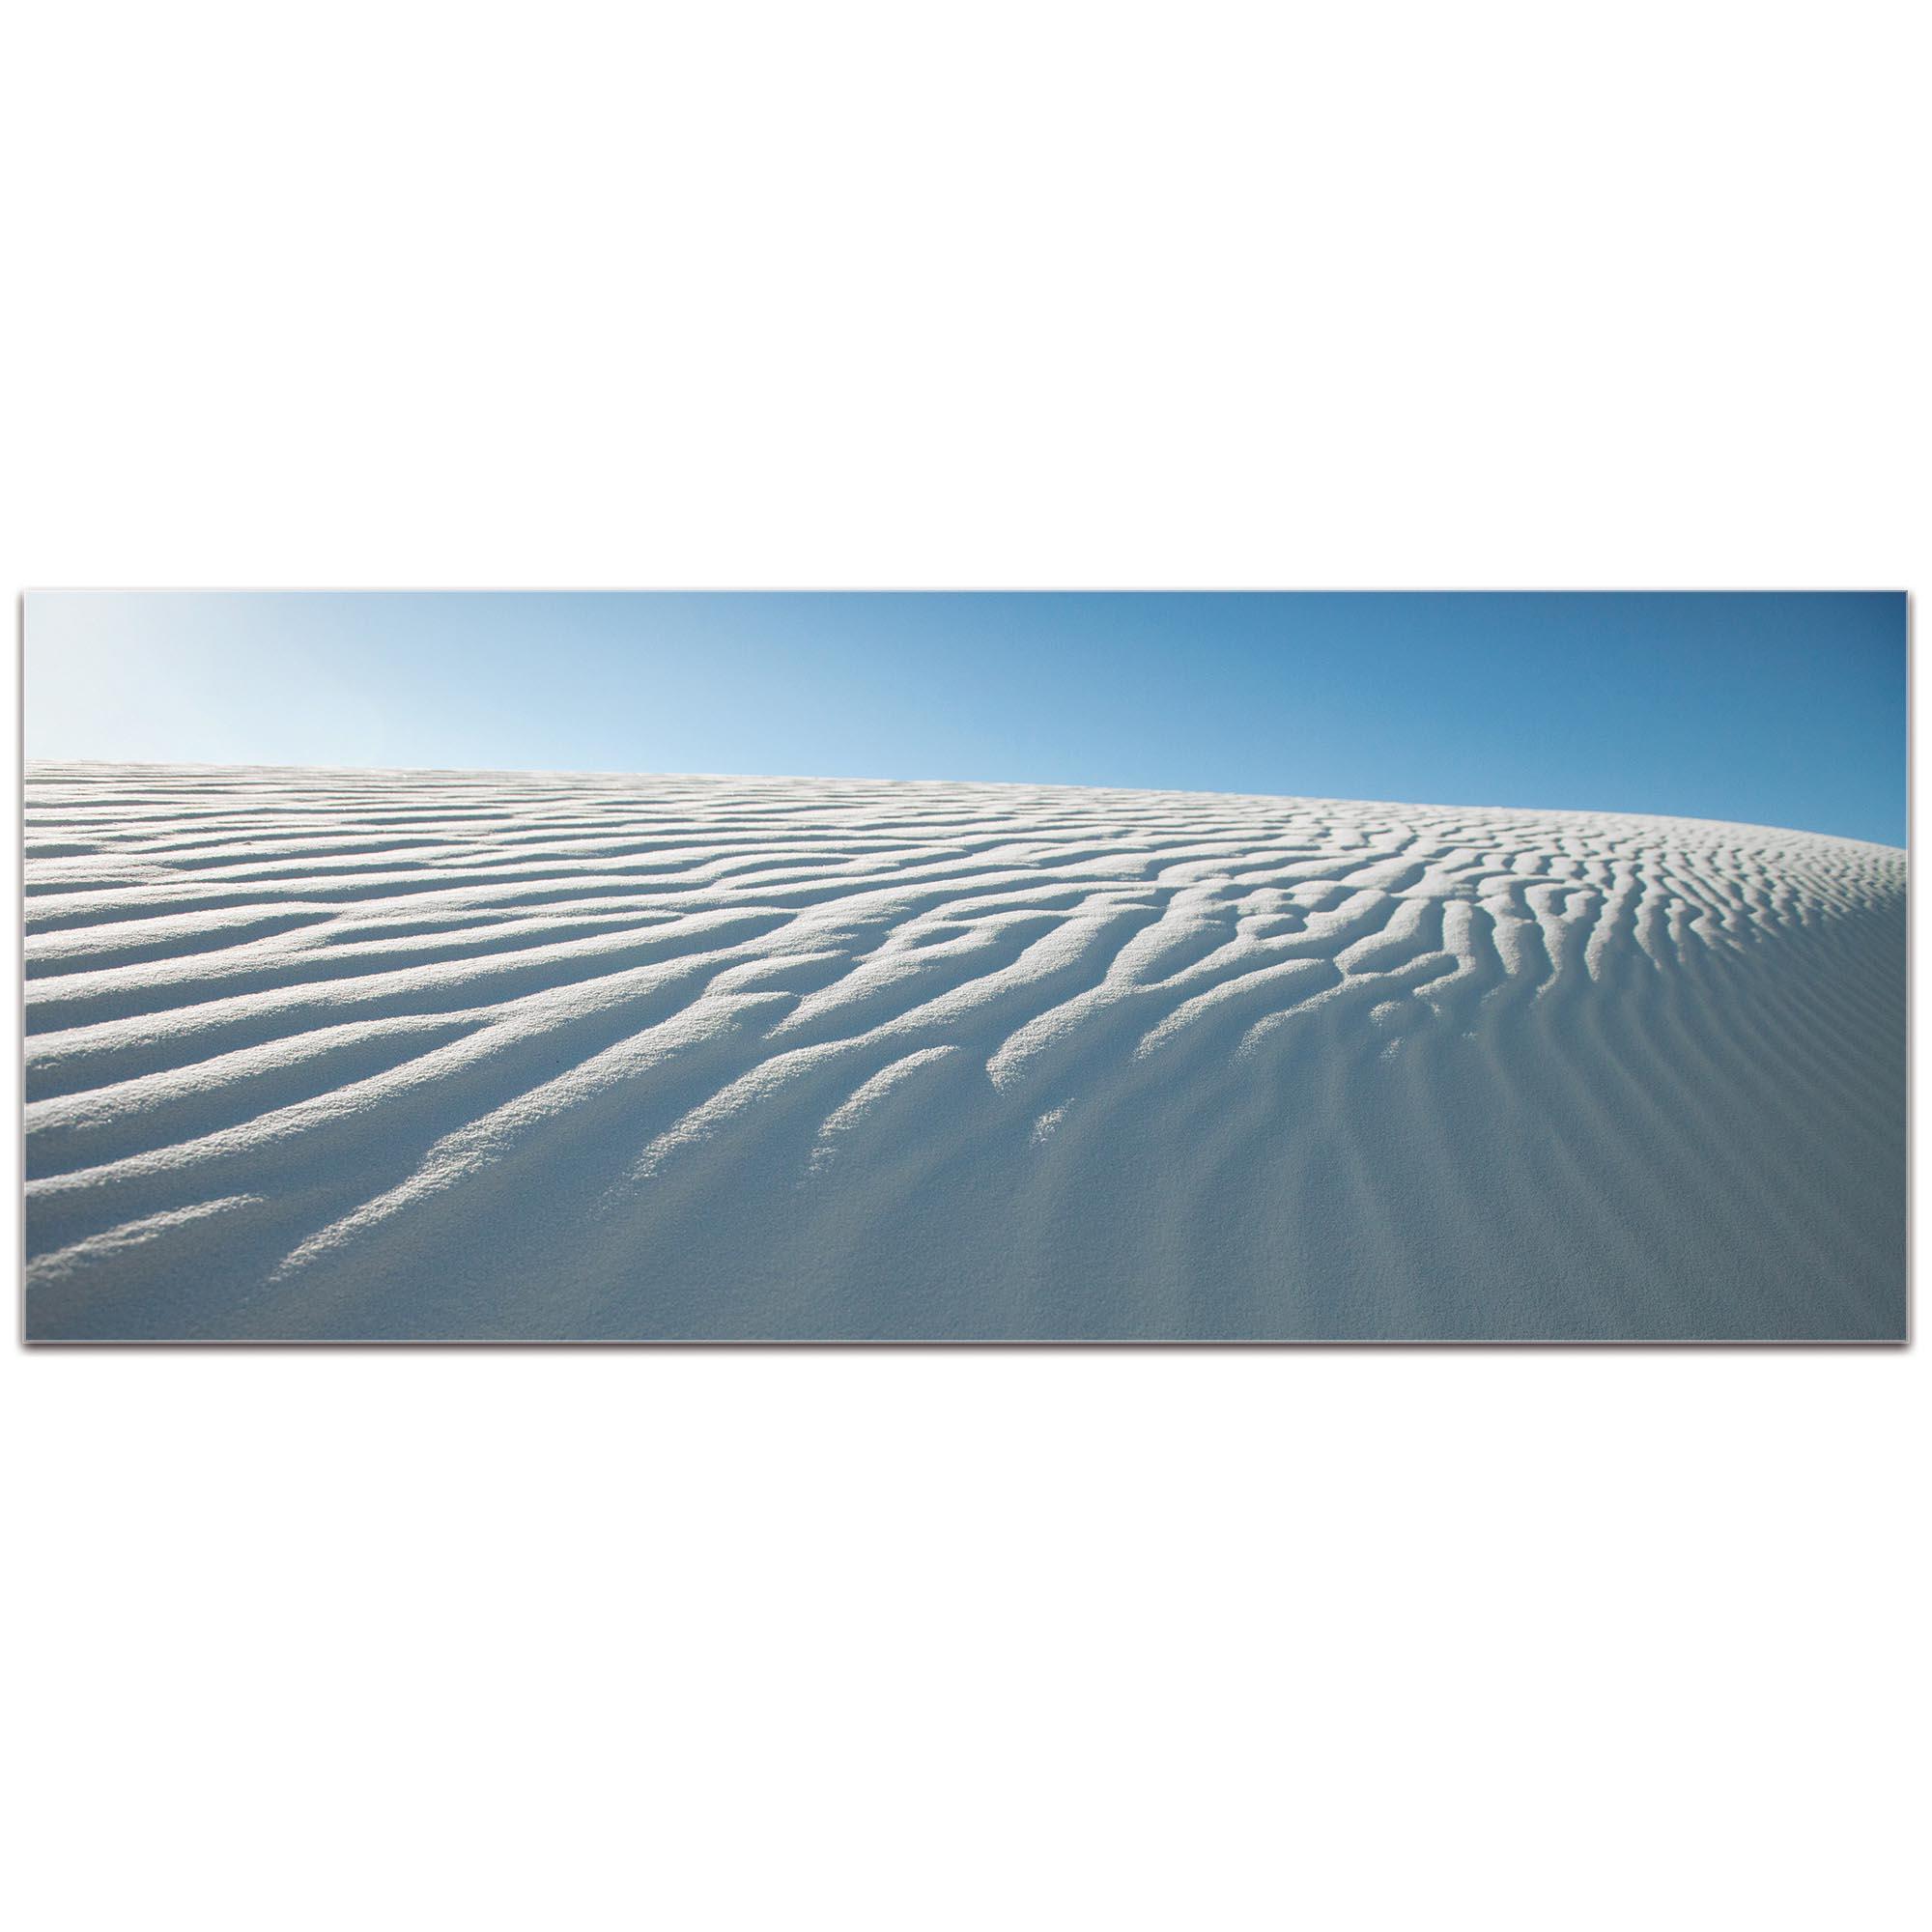 Landscape Photography 'Rippled Sand' - Sand Dunes Art on Metal or Plexiglass - Image 2